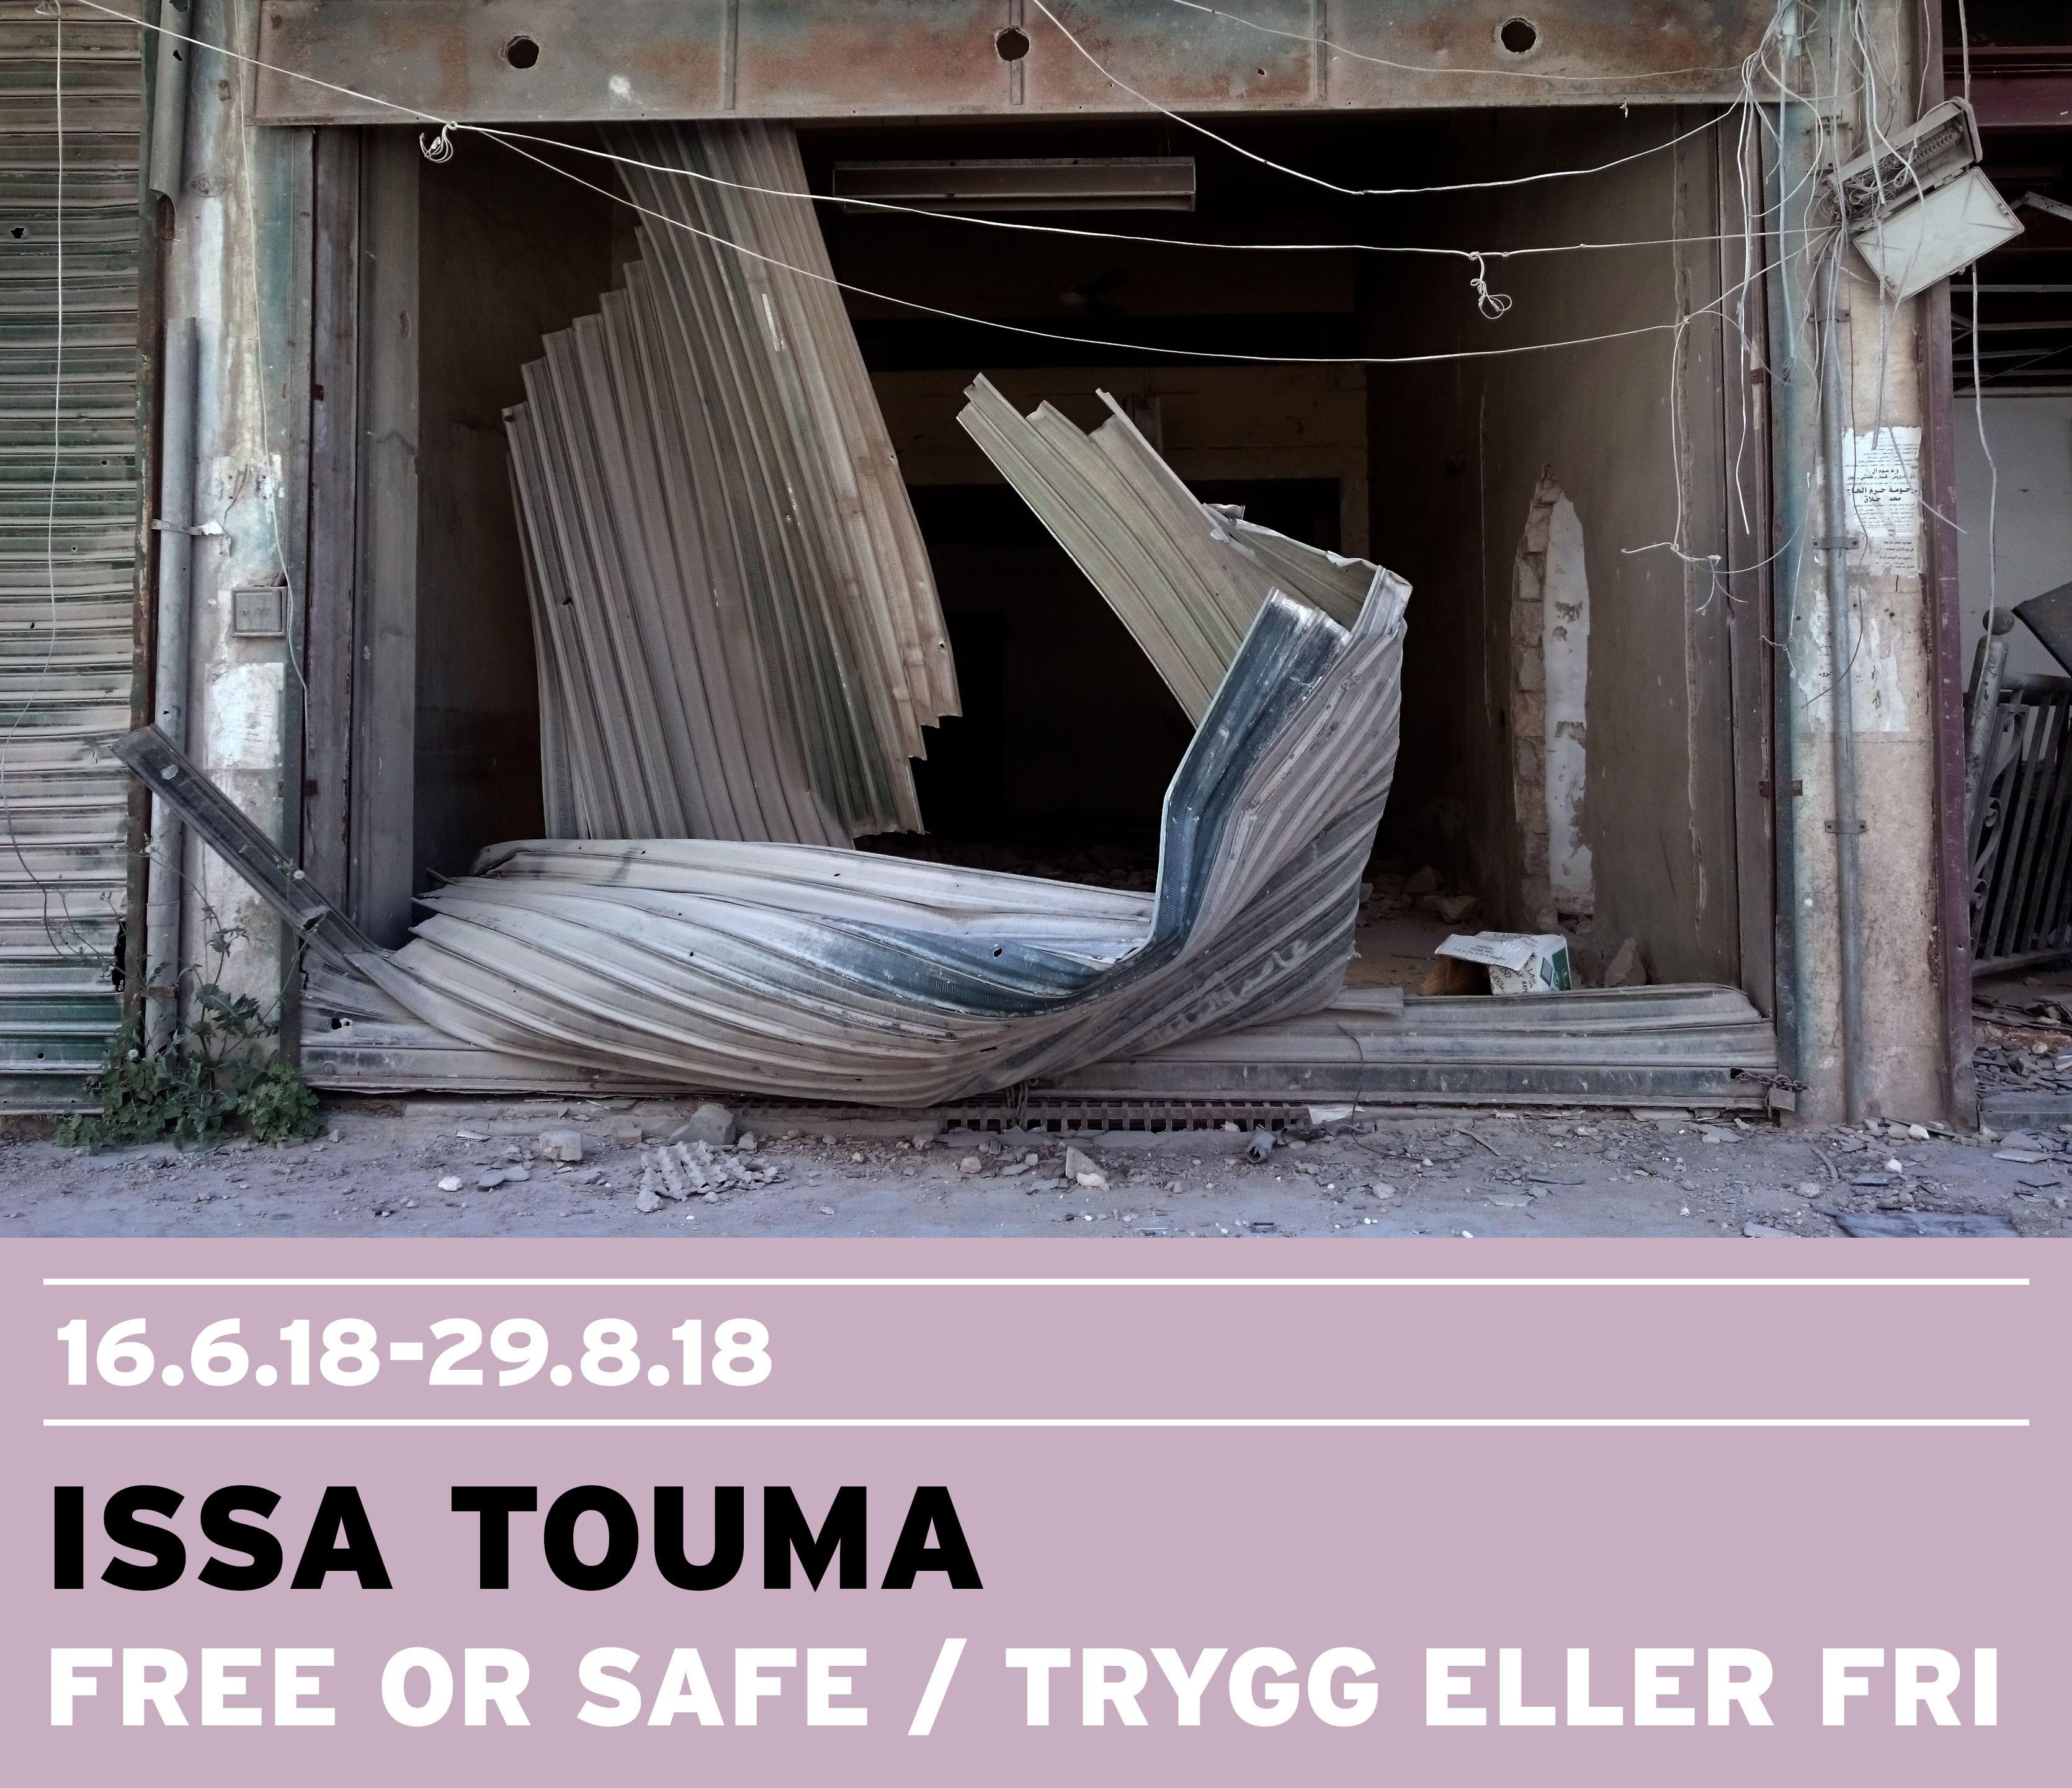 Issa Touma, Vernissage: Issa Touma - Free or safe/Trygg eller fri